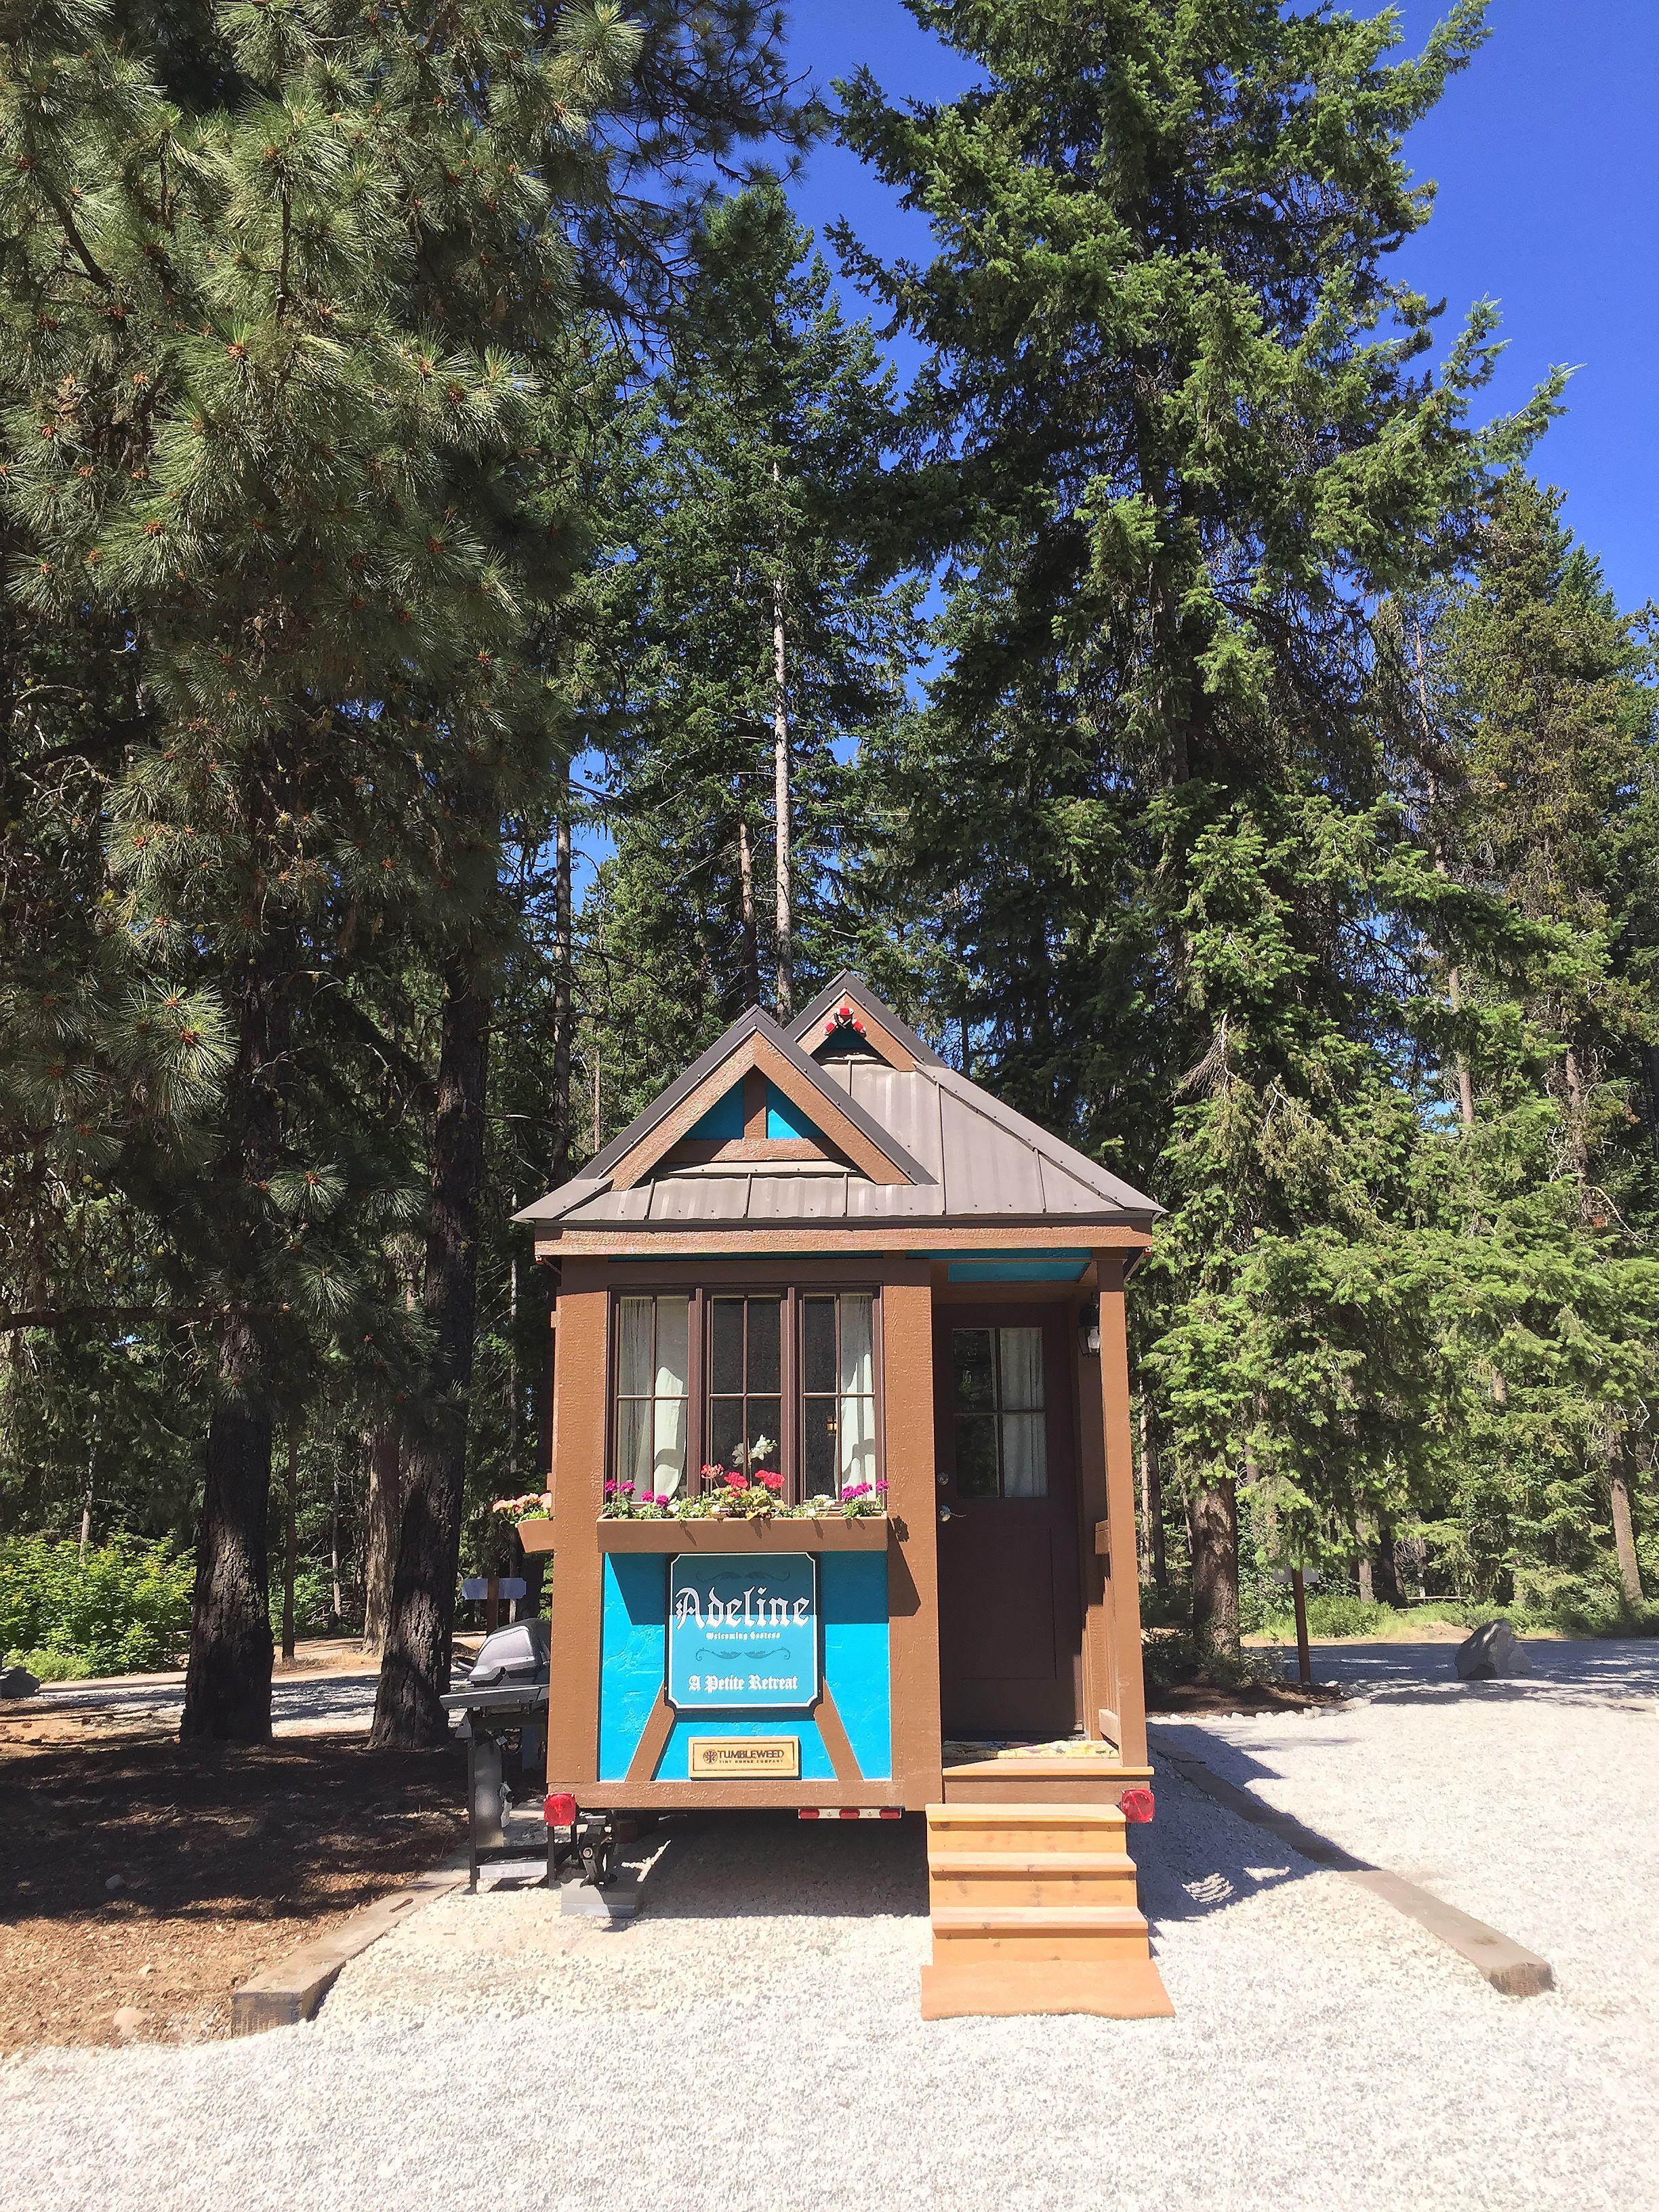 Meet Adeline At Leavenworth Tiny House Village In